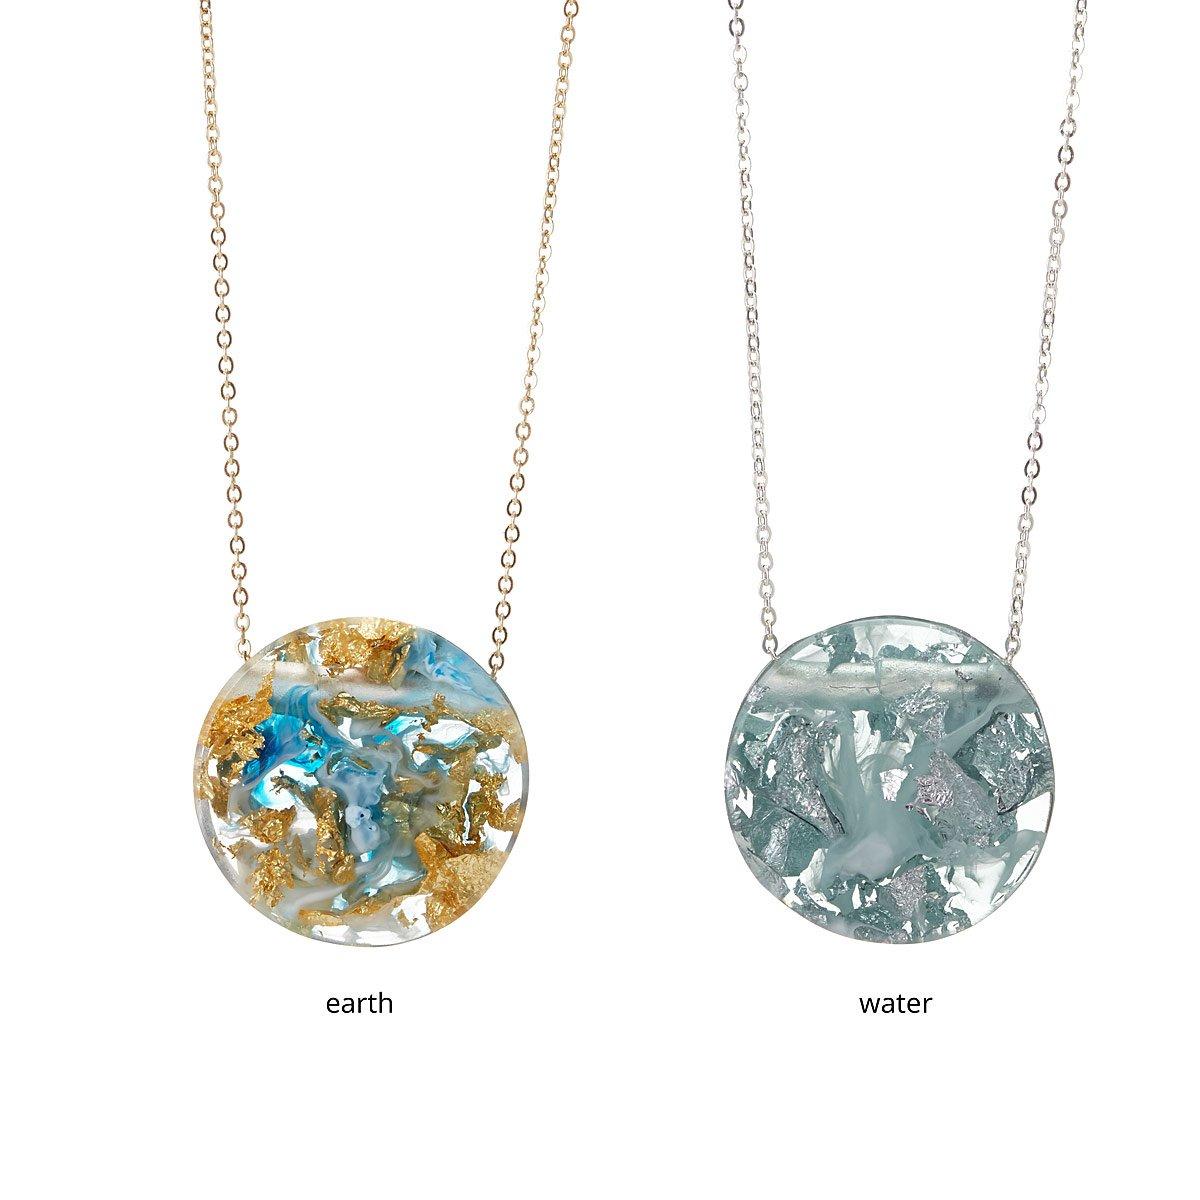 Origami Menagerie Necklaces   Origami jewelry, Origami necklace ...